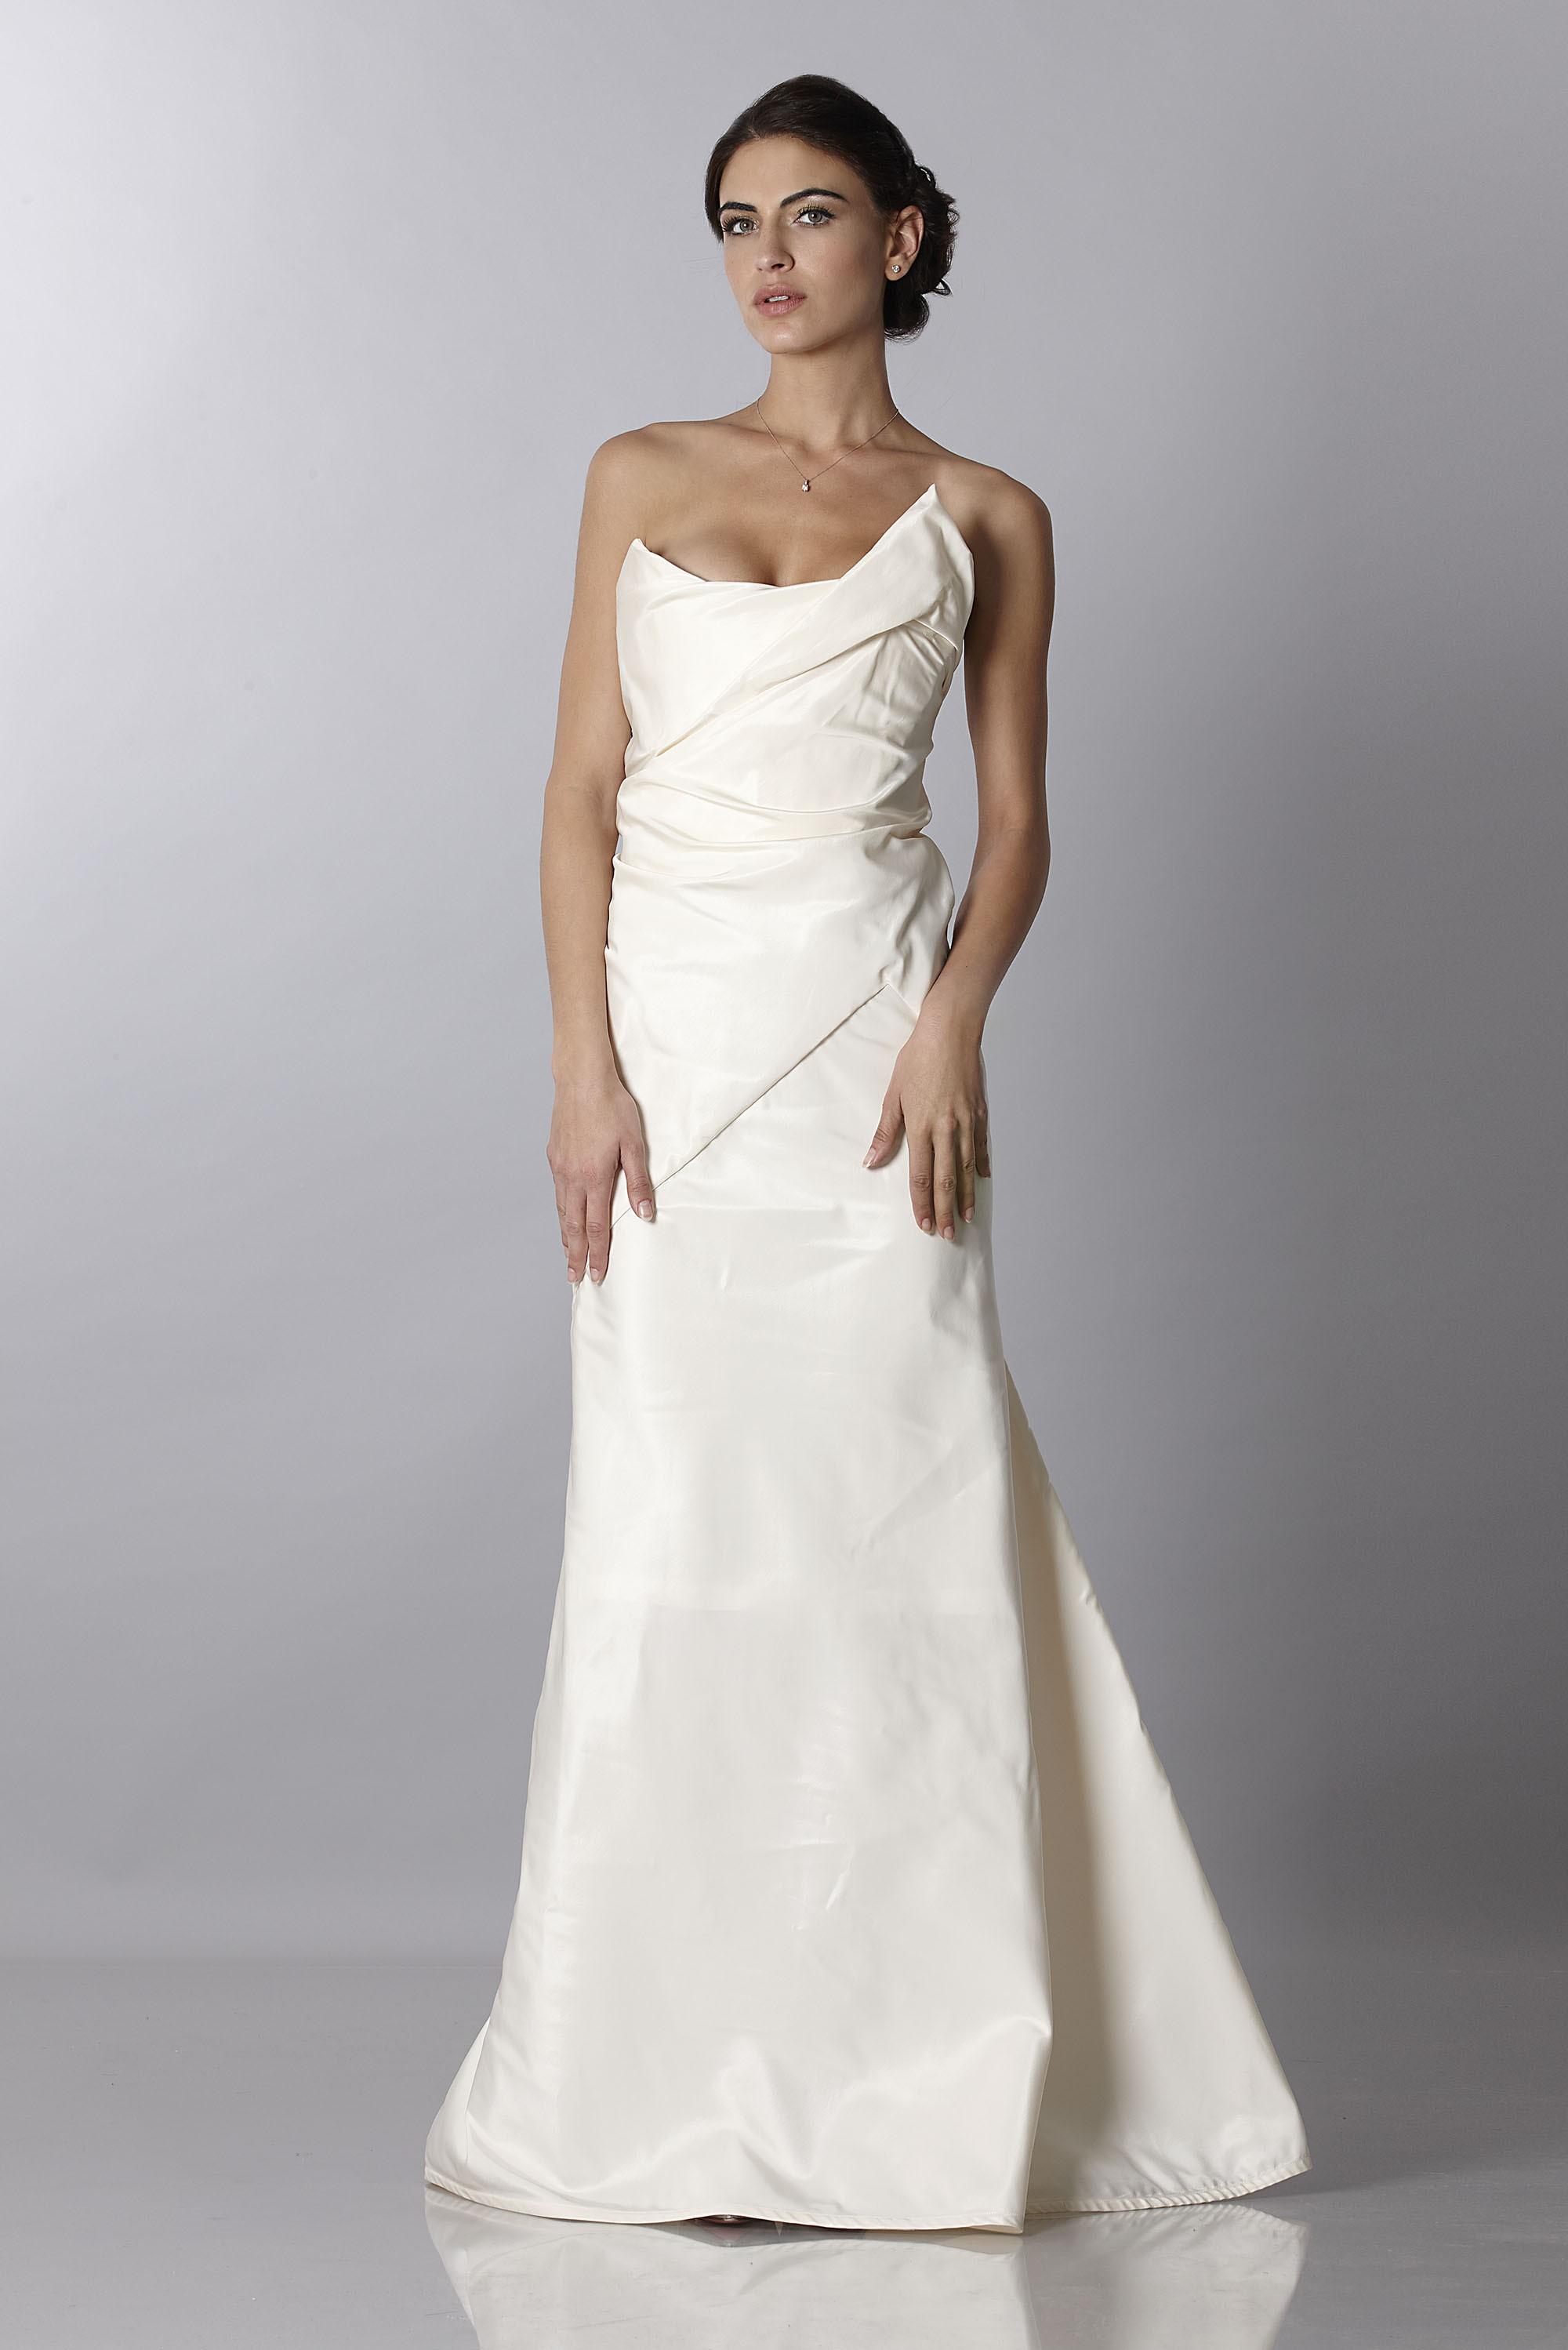 Drexcode - Vivienne Westwood Wedding dress | Rent luxury dress